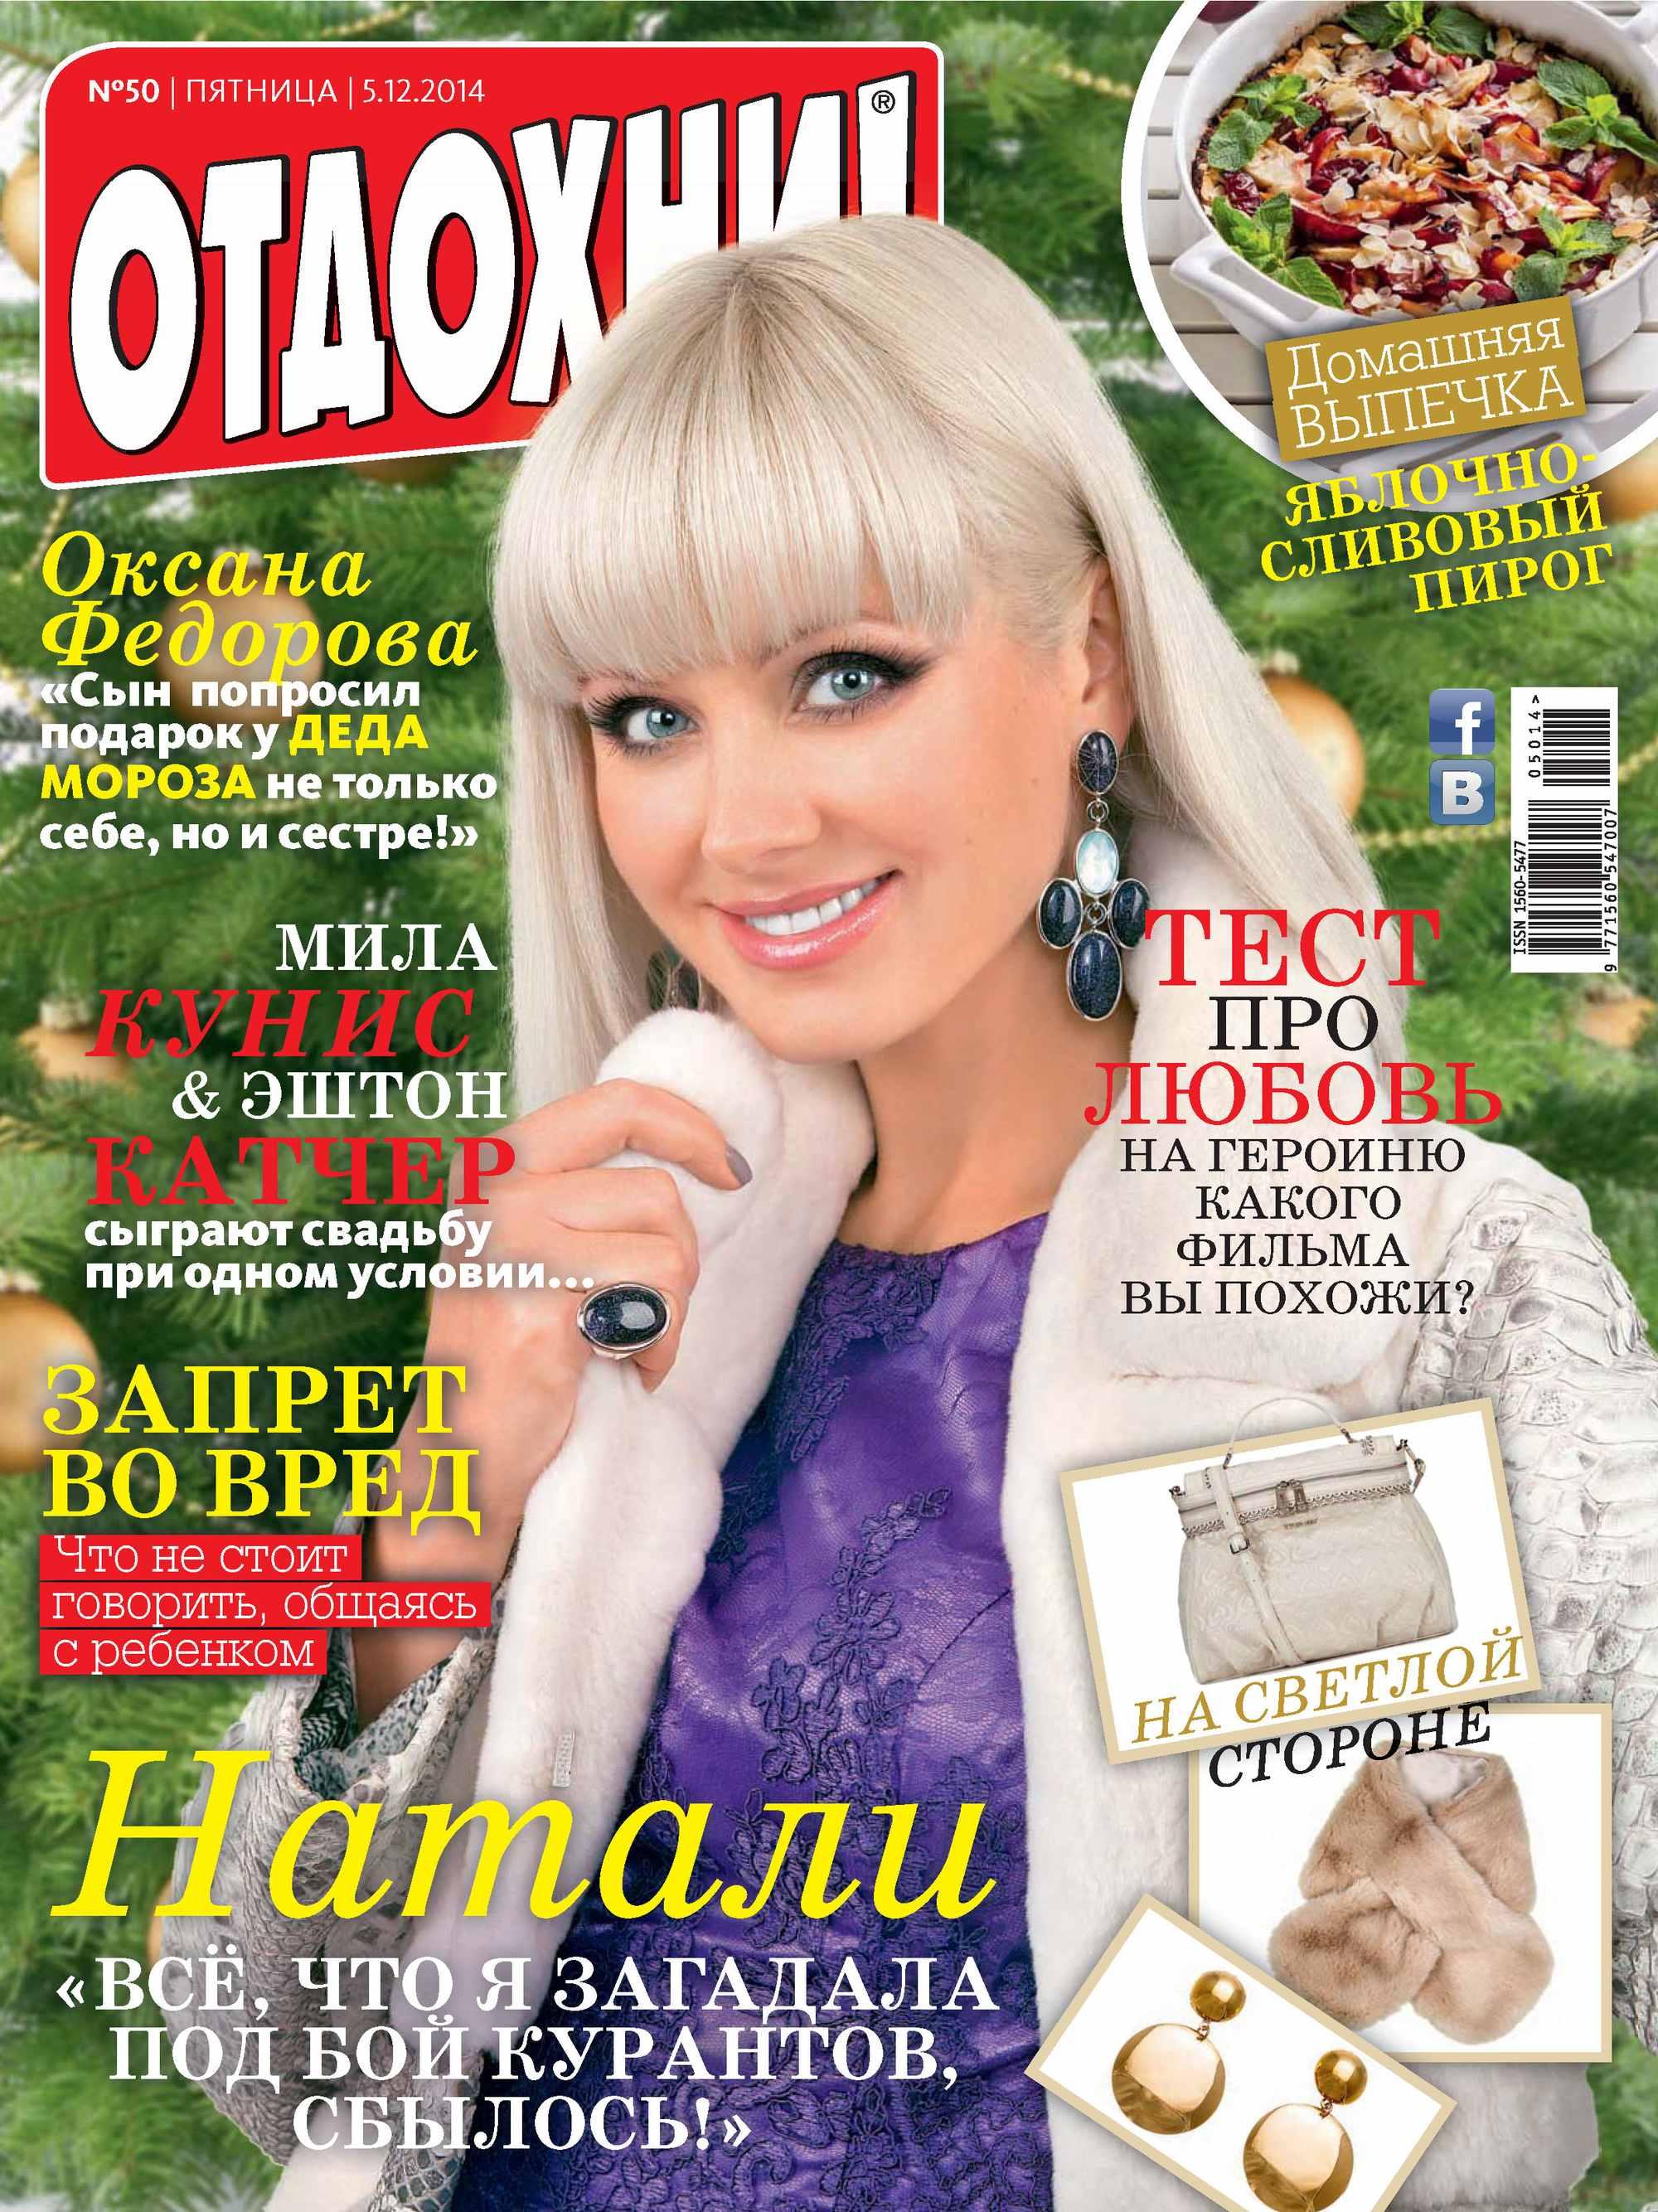 ИД «Бурда» Журнал «Отдохни!» №50/2014 цена